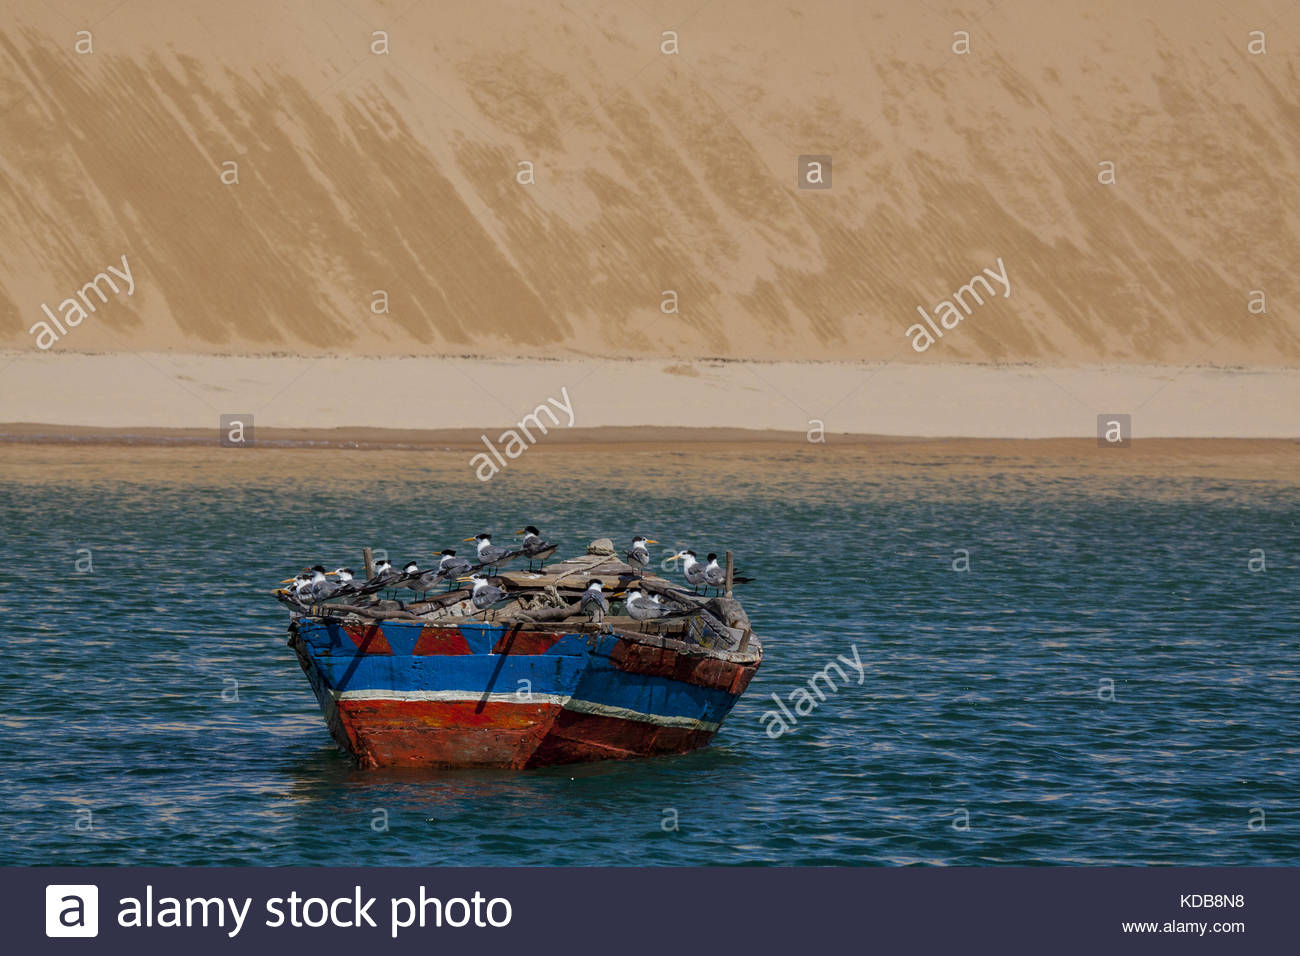 Elegant Terns, Thalasseus Elegans, use an anchored boat as a vantage point to spot fish. - Stock Image